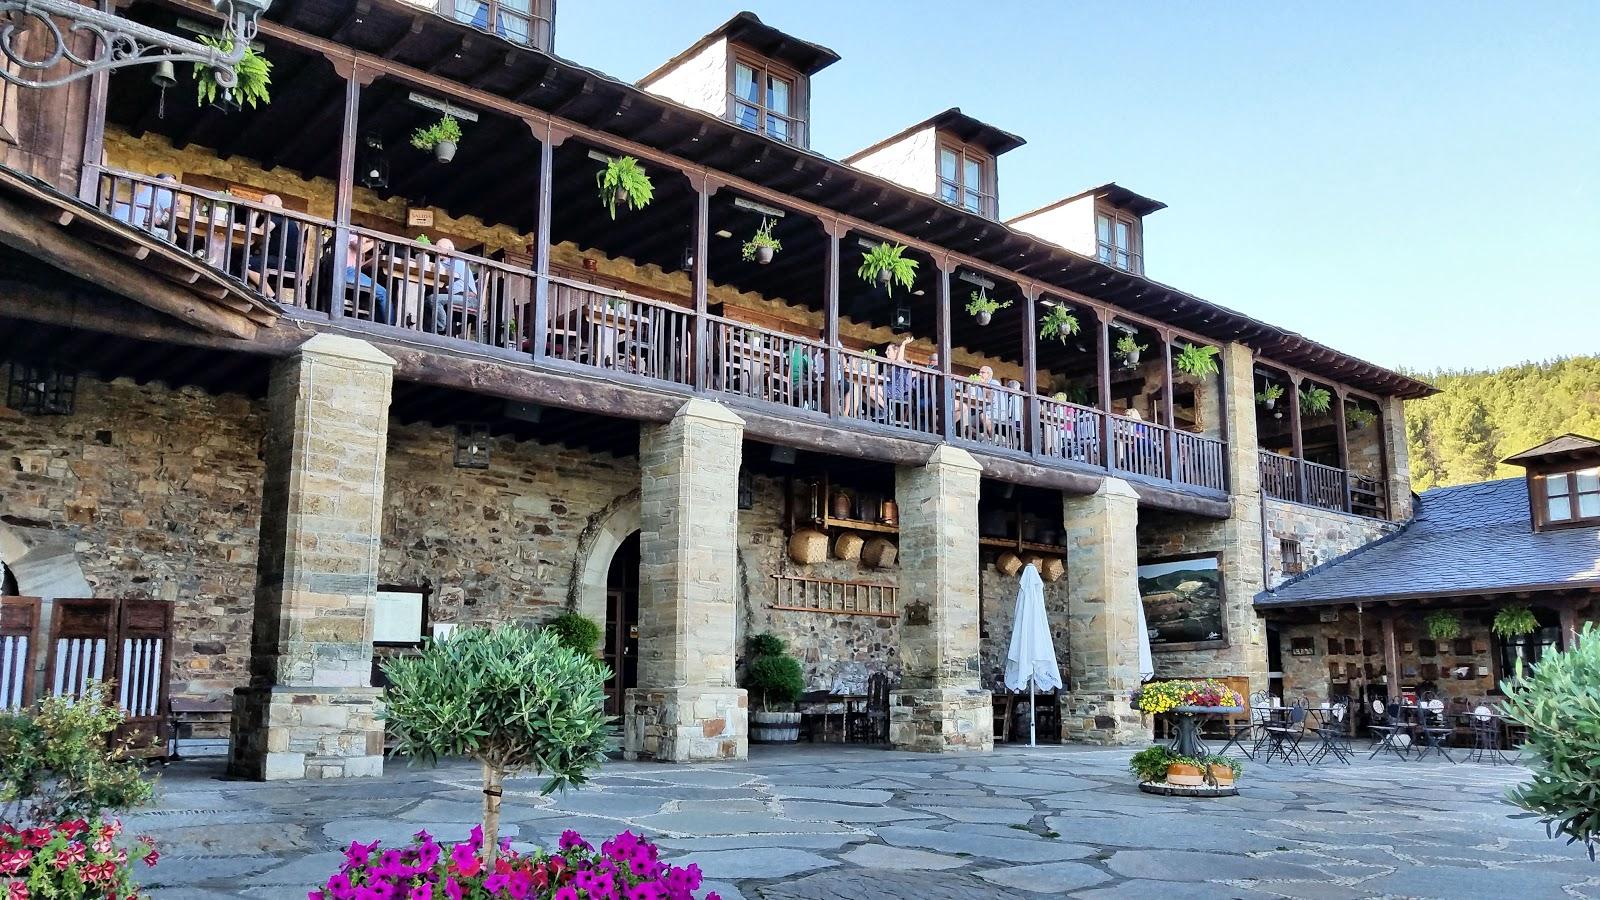 Benvenidos a Palacio de Canedo—winery, hotel and restaurant nestled among the hills of vineyards near Cacabelos, Spain.